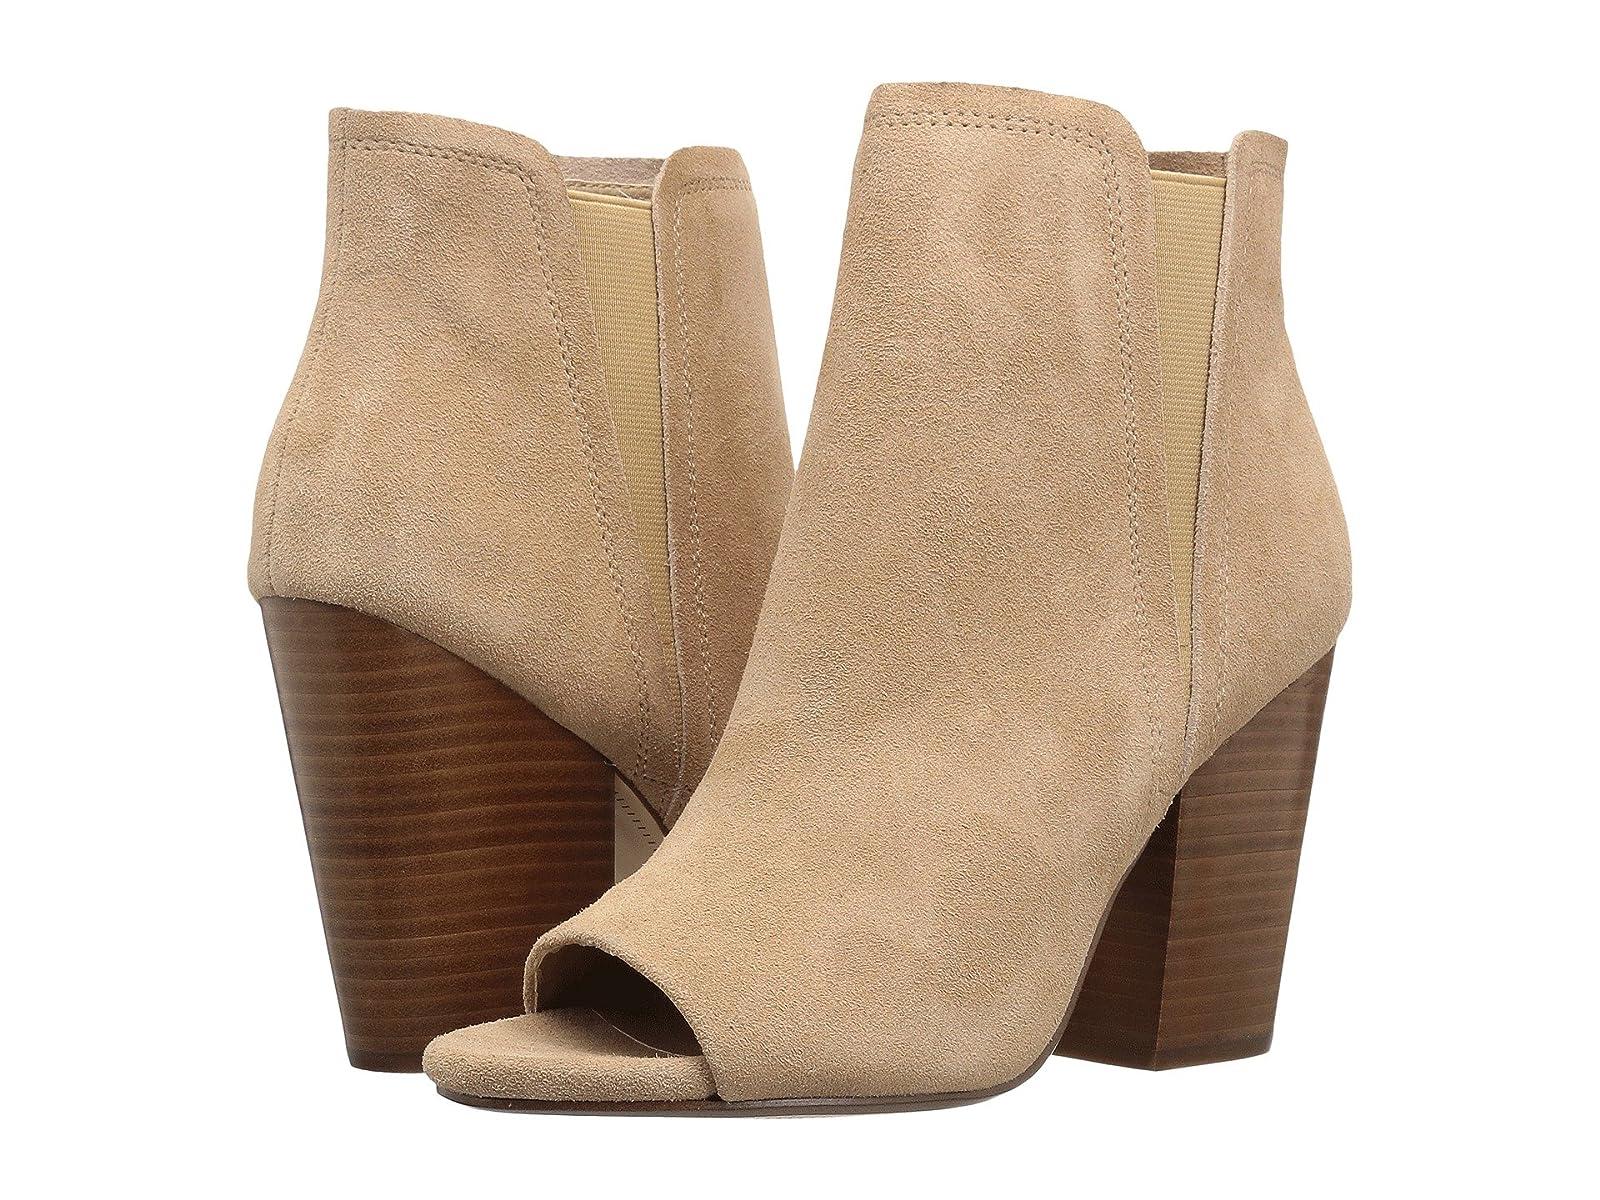 Splendid KendyllCheap and distinctive eye-catching shoes